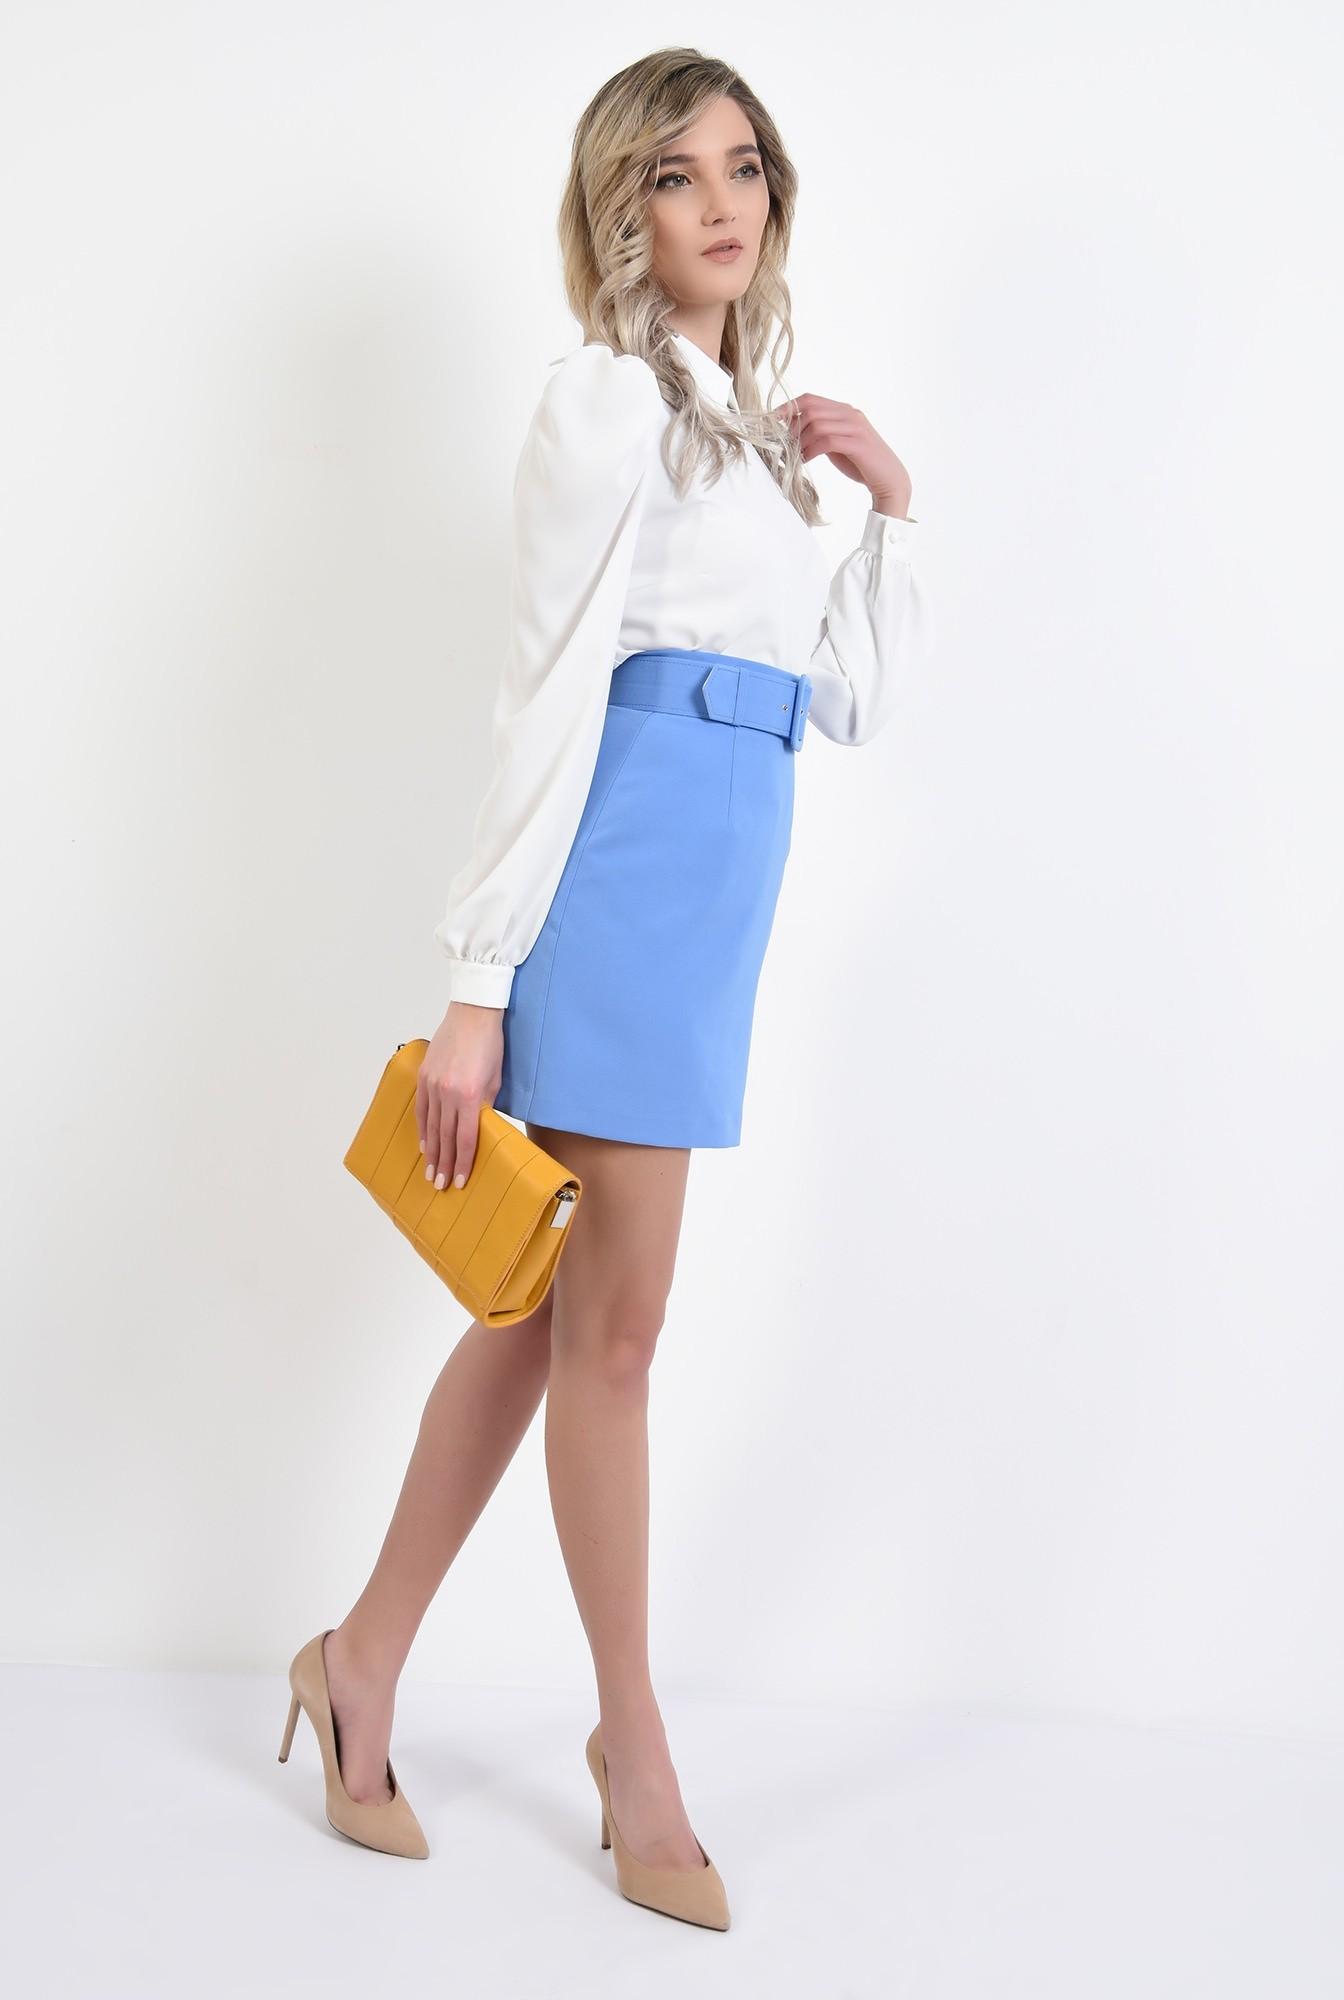 3 - bluza office, maneca lunga, guler rotunjit, ivoar, bluza de primavara